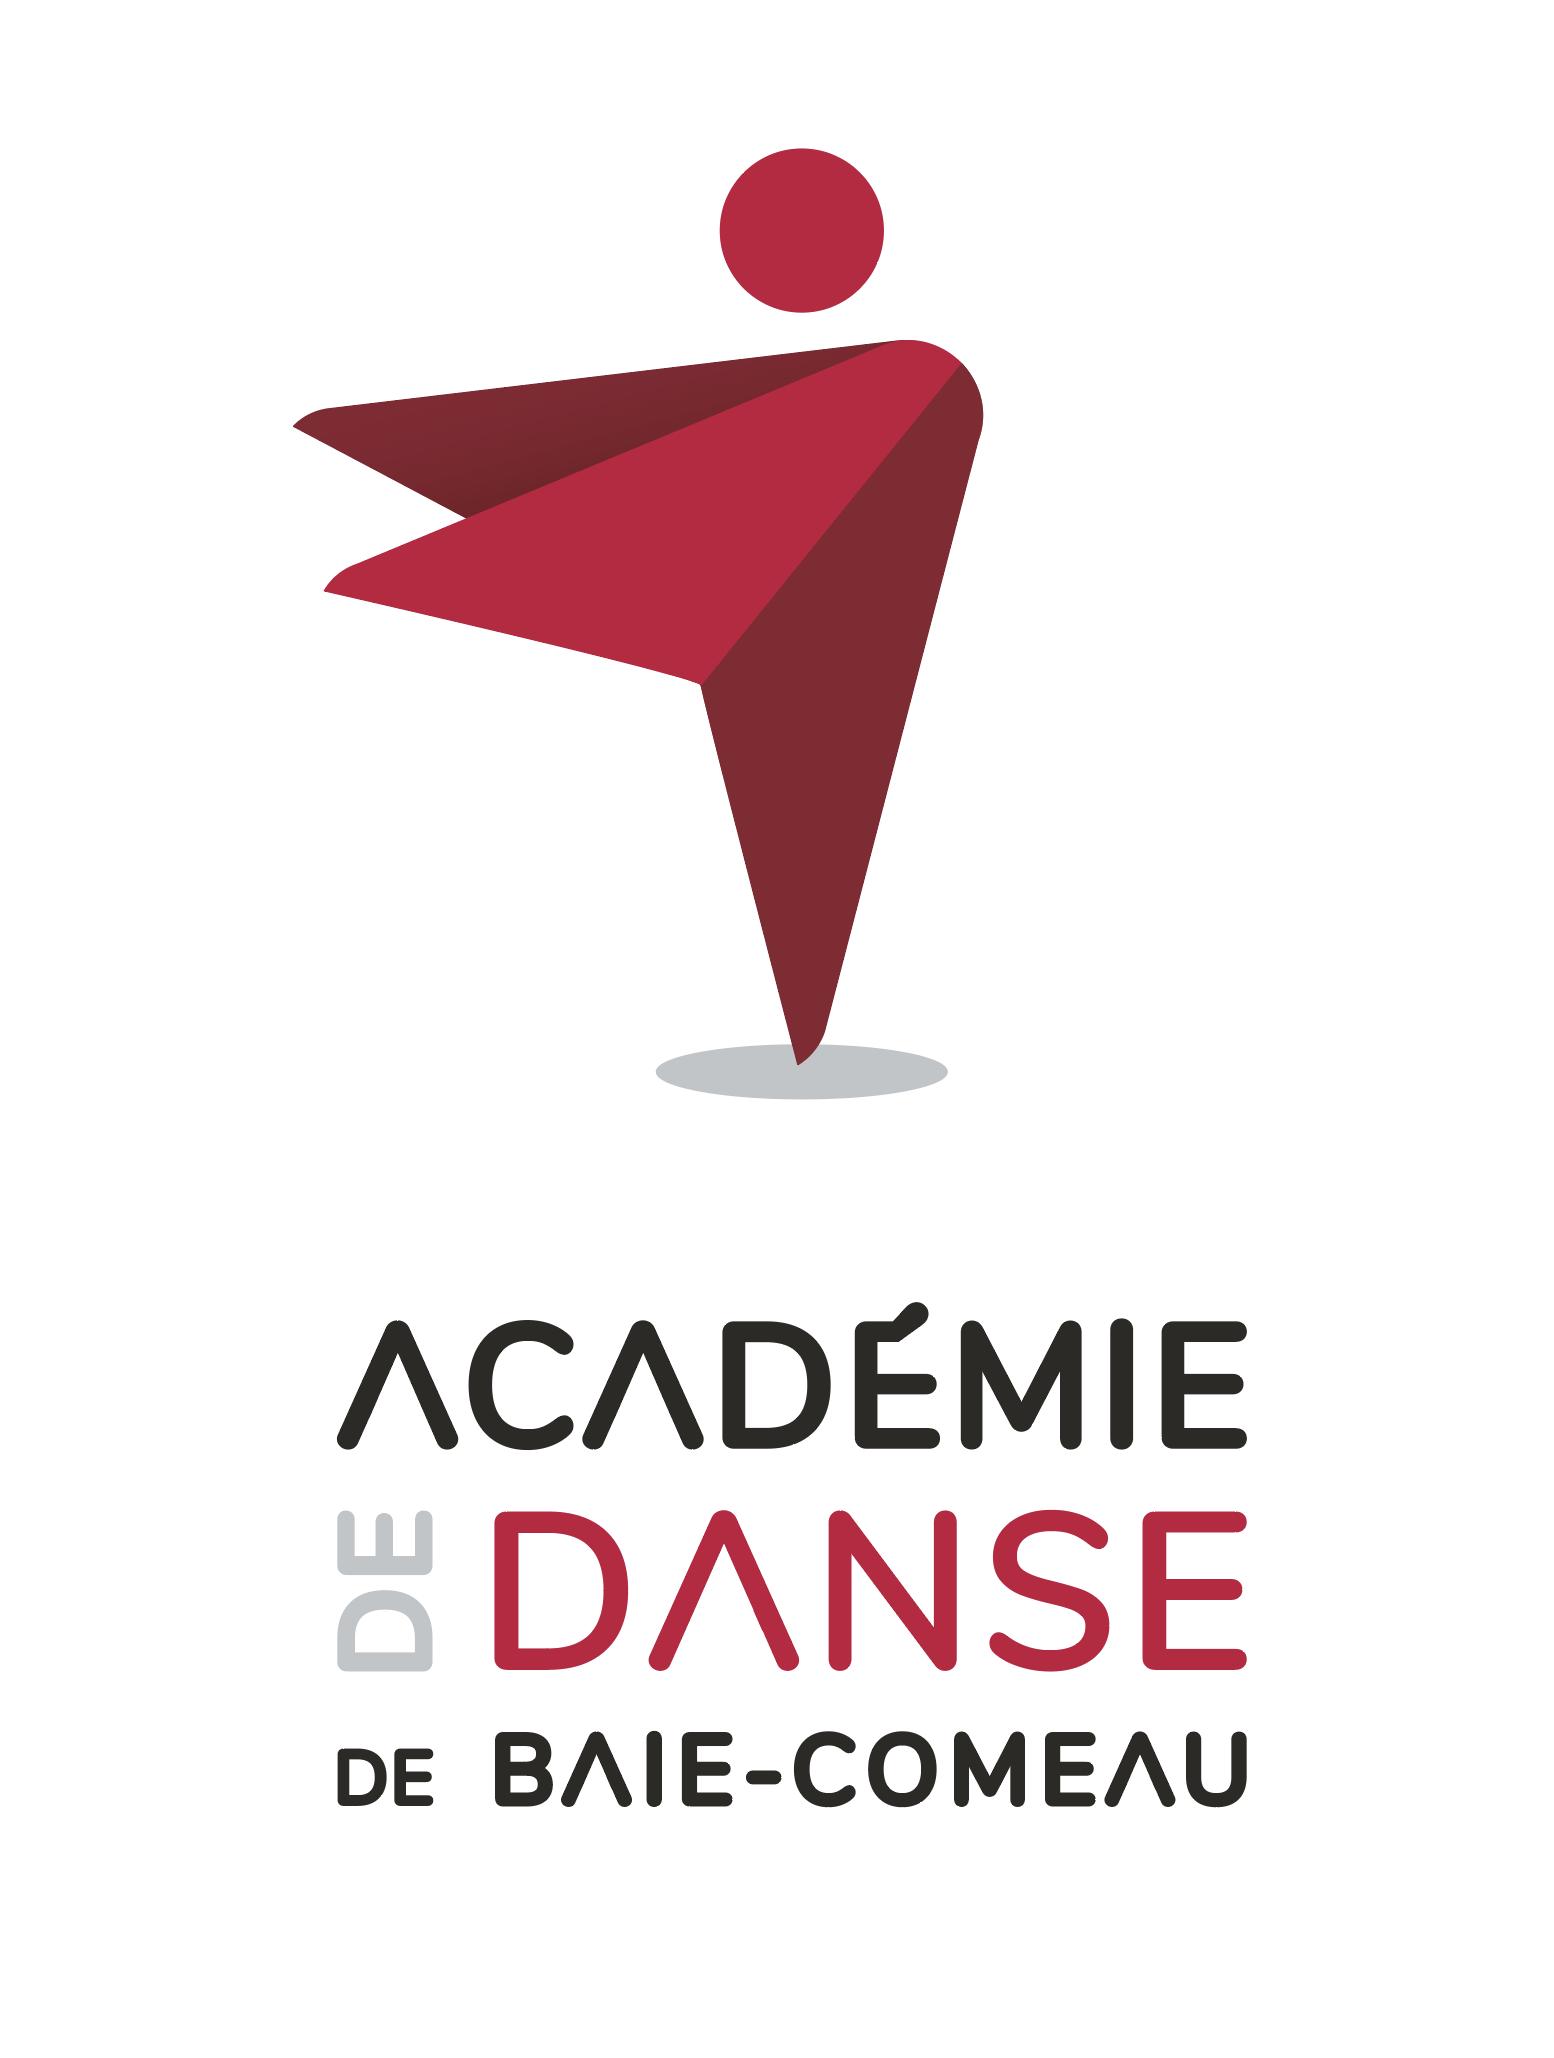 https://centredesartsbc.com/wp-content/uploads/2020/08/1.3-Academie-de-danse.png